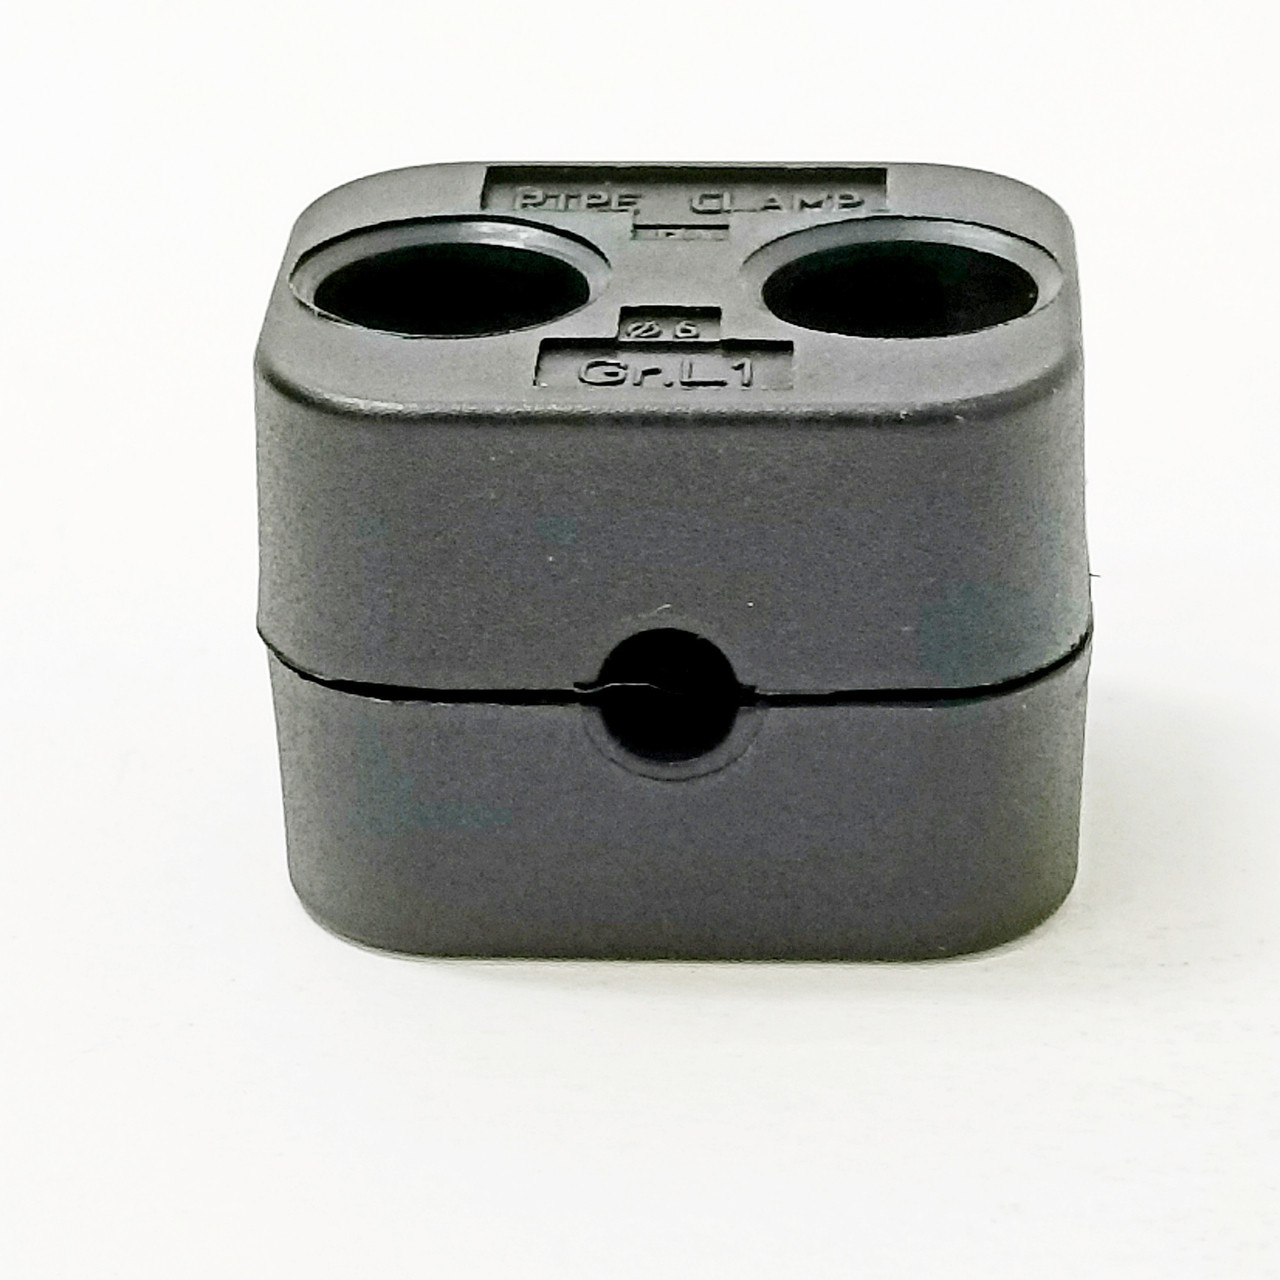 CB112 Clamp Body 12mm OD